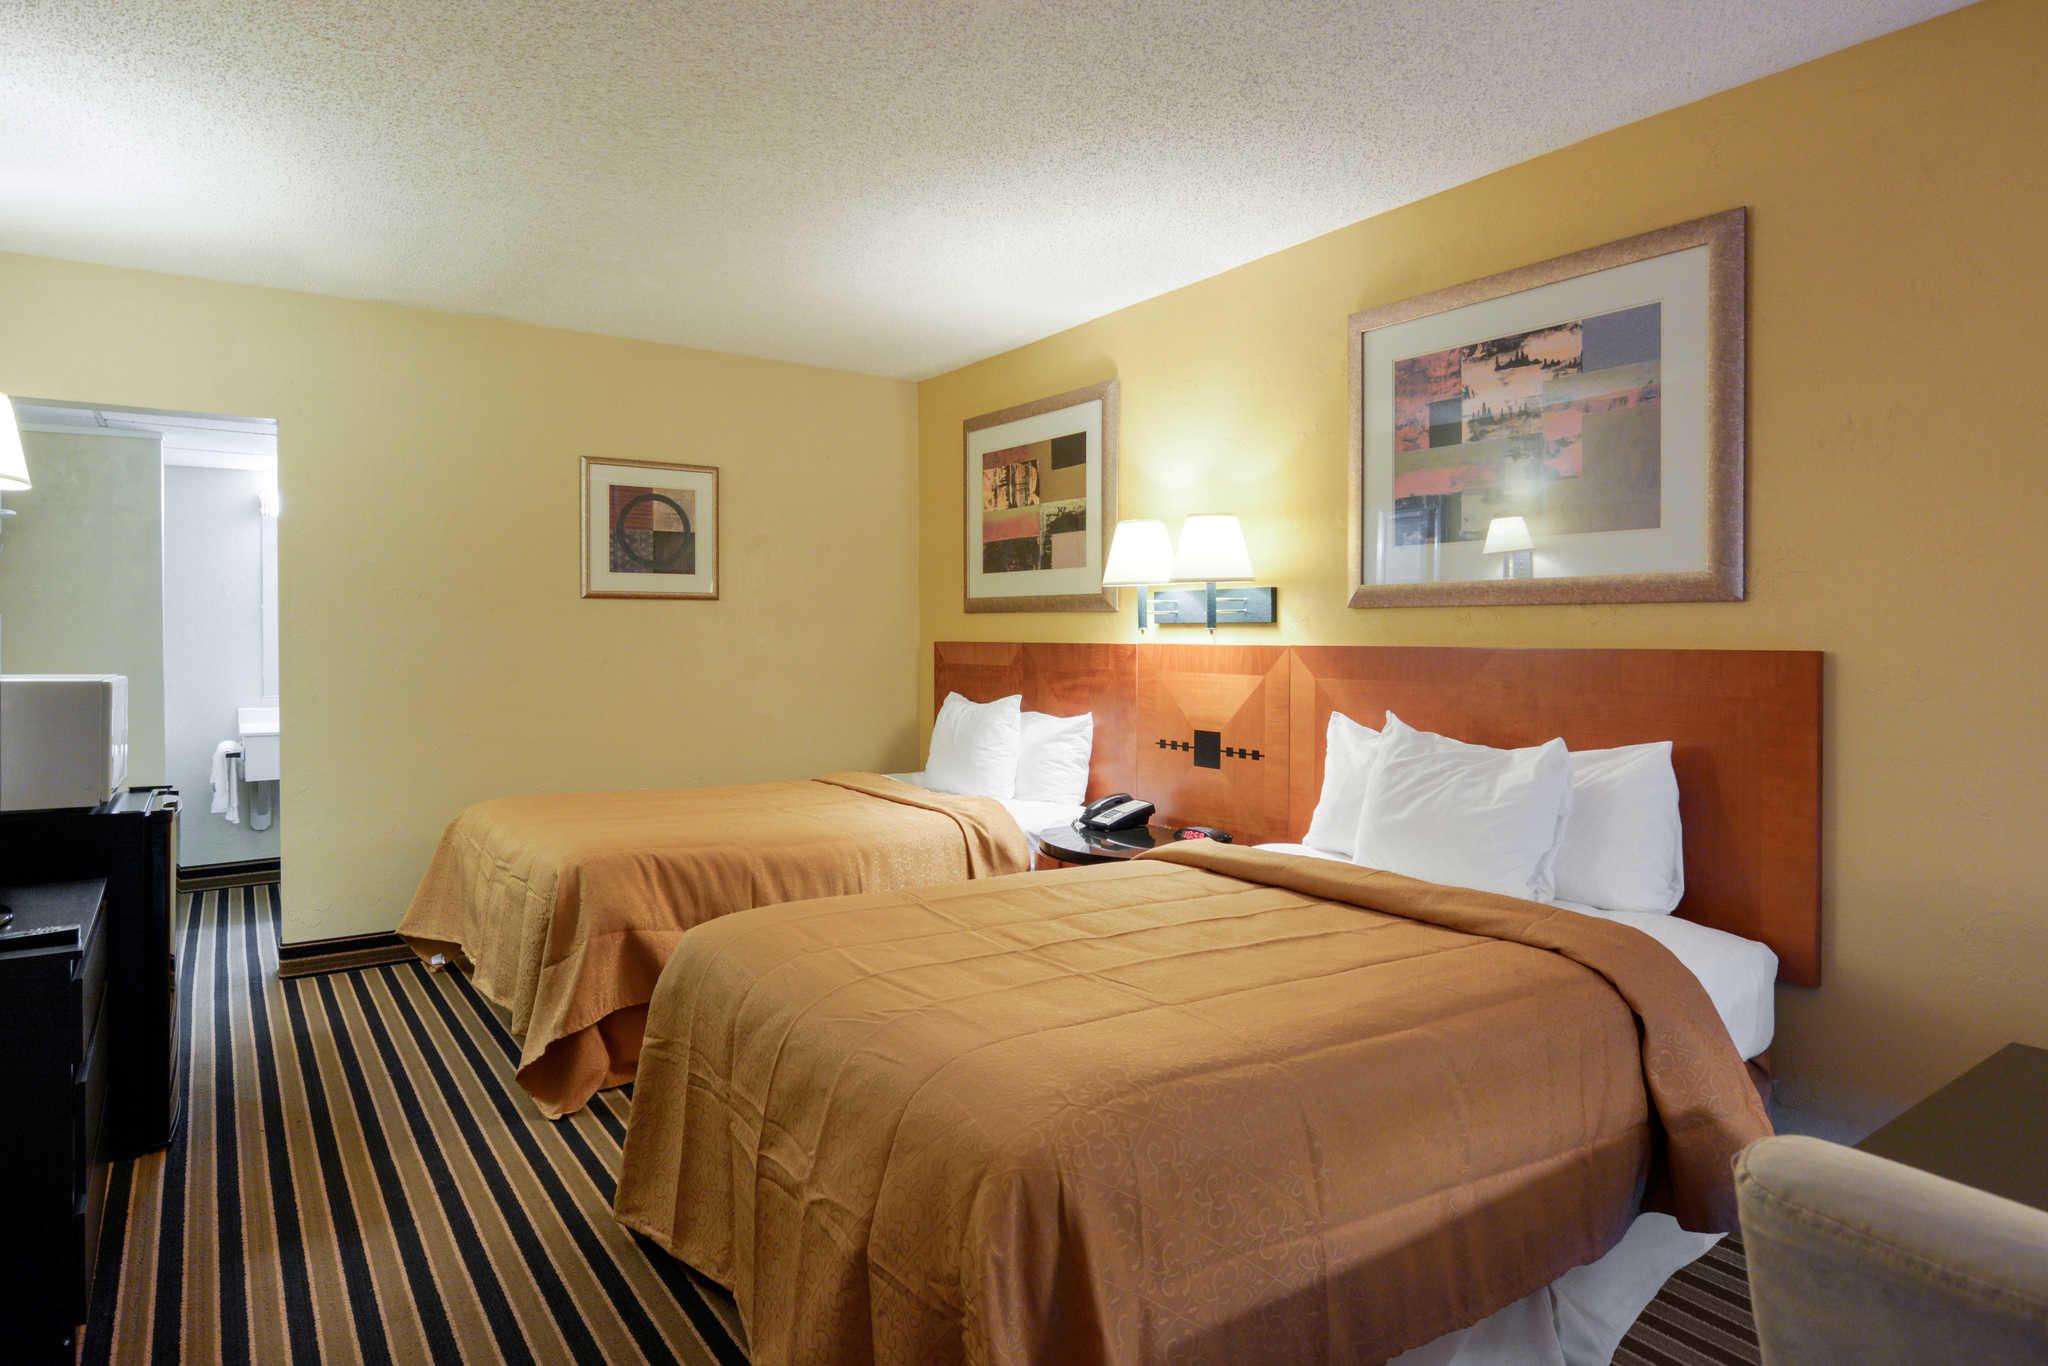 Quality Inn Skyline Drive image 18